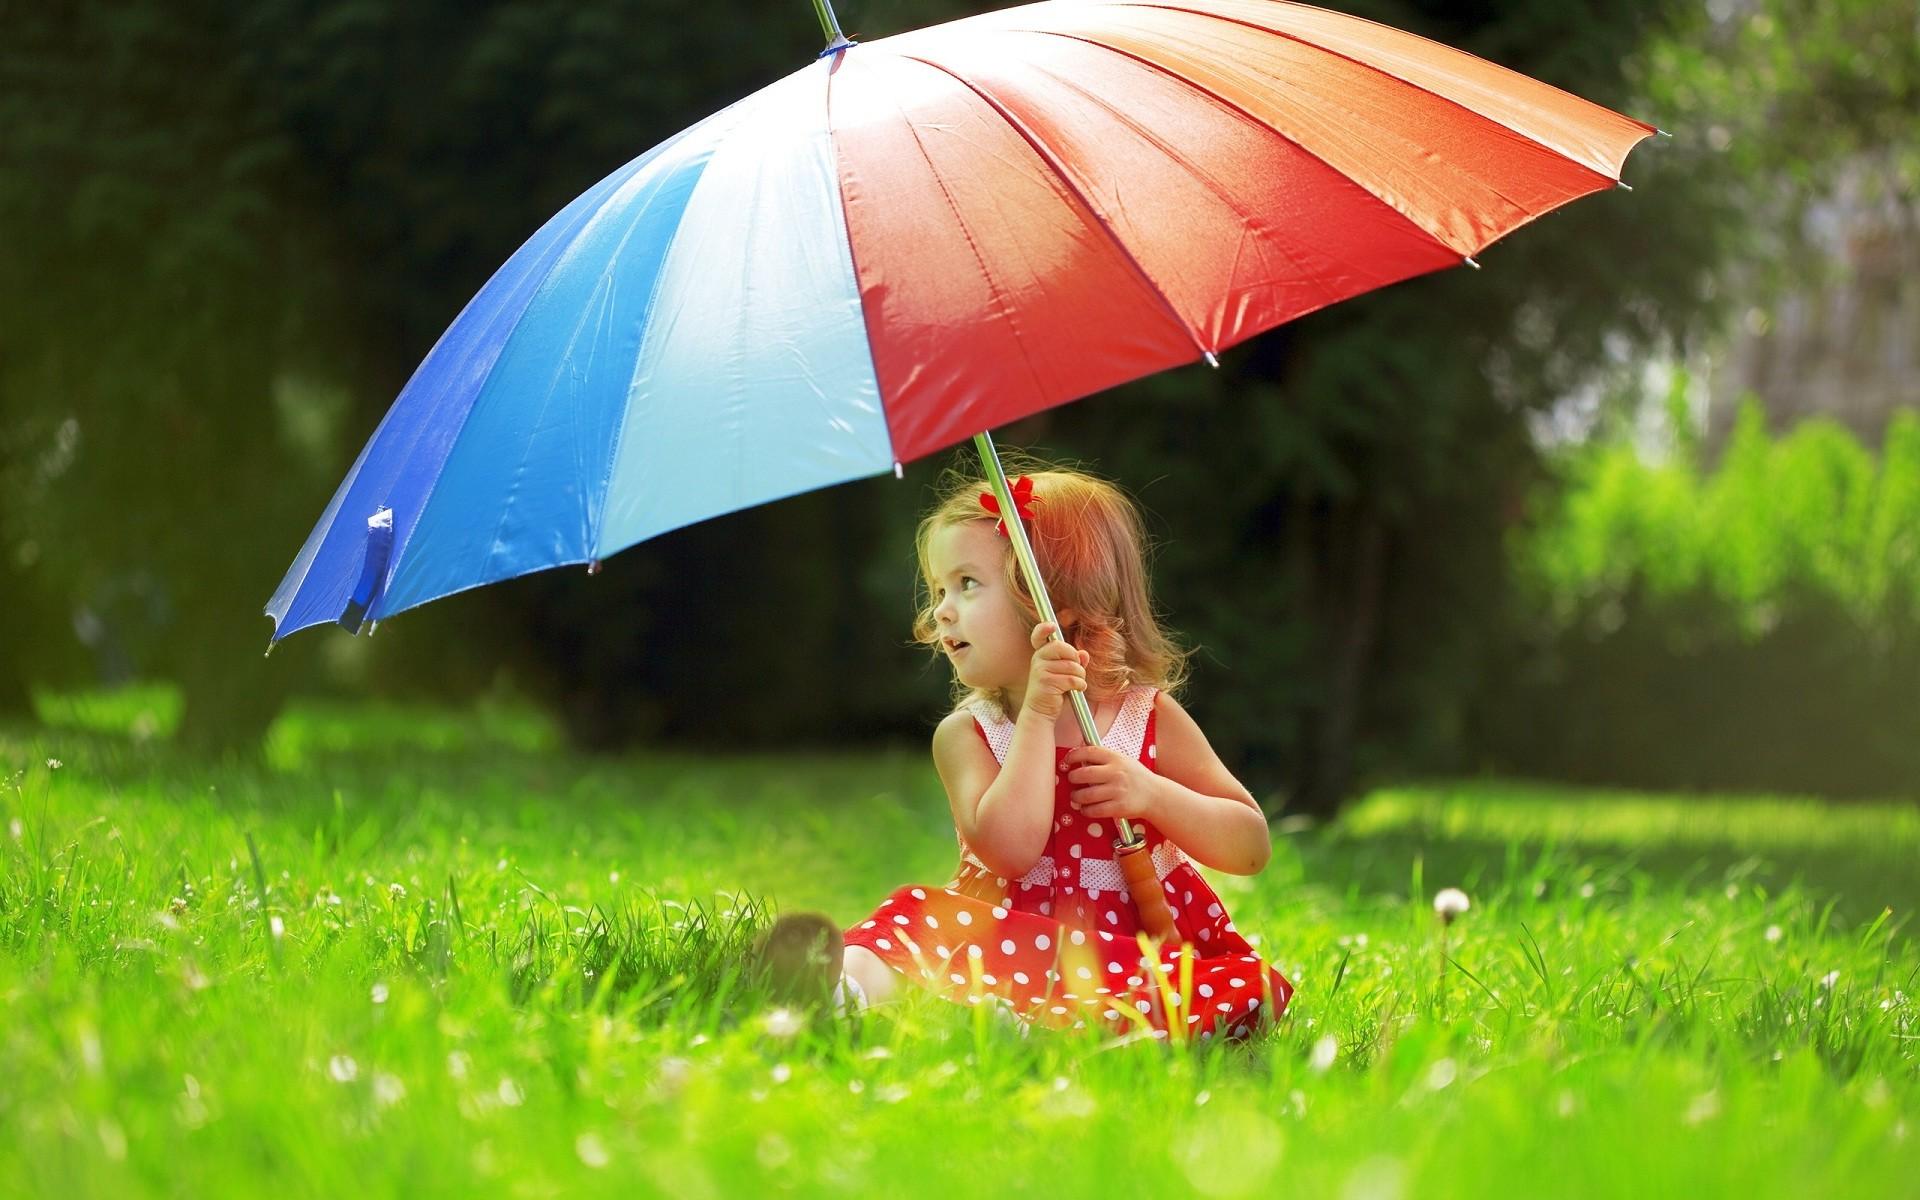 Rainy Season HD Wallpapers, Rain makes our life most beautiful .So, Rainy  season